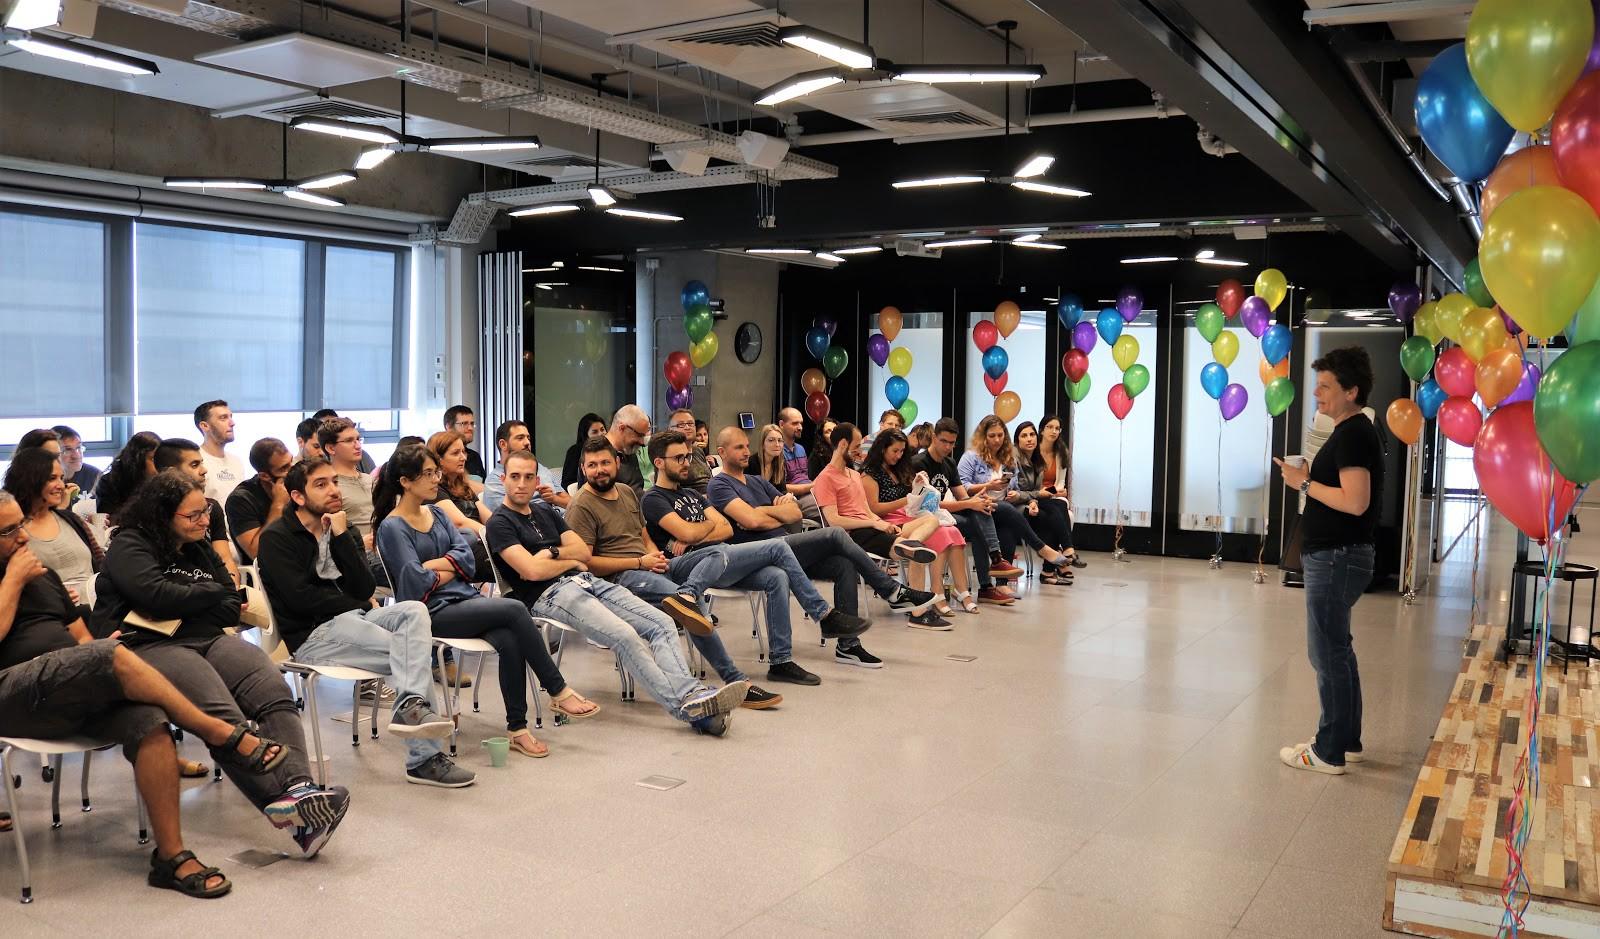 A presentation by the Palo Alto Networks LGBTQIA+ Employee Network